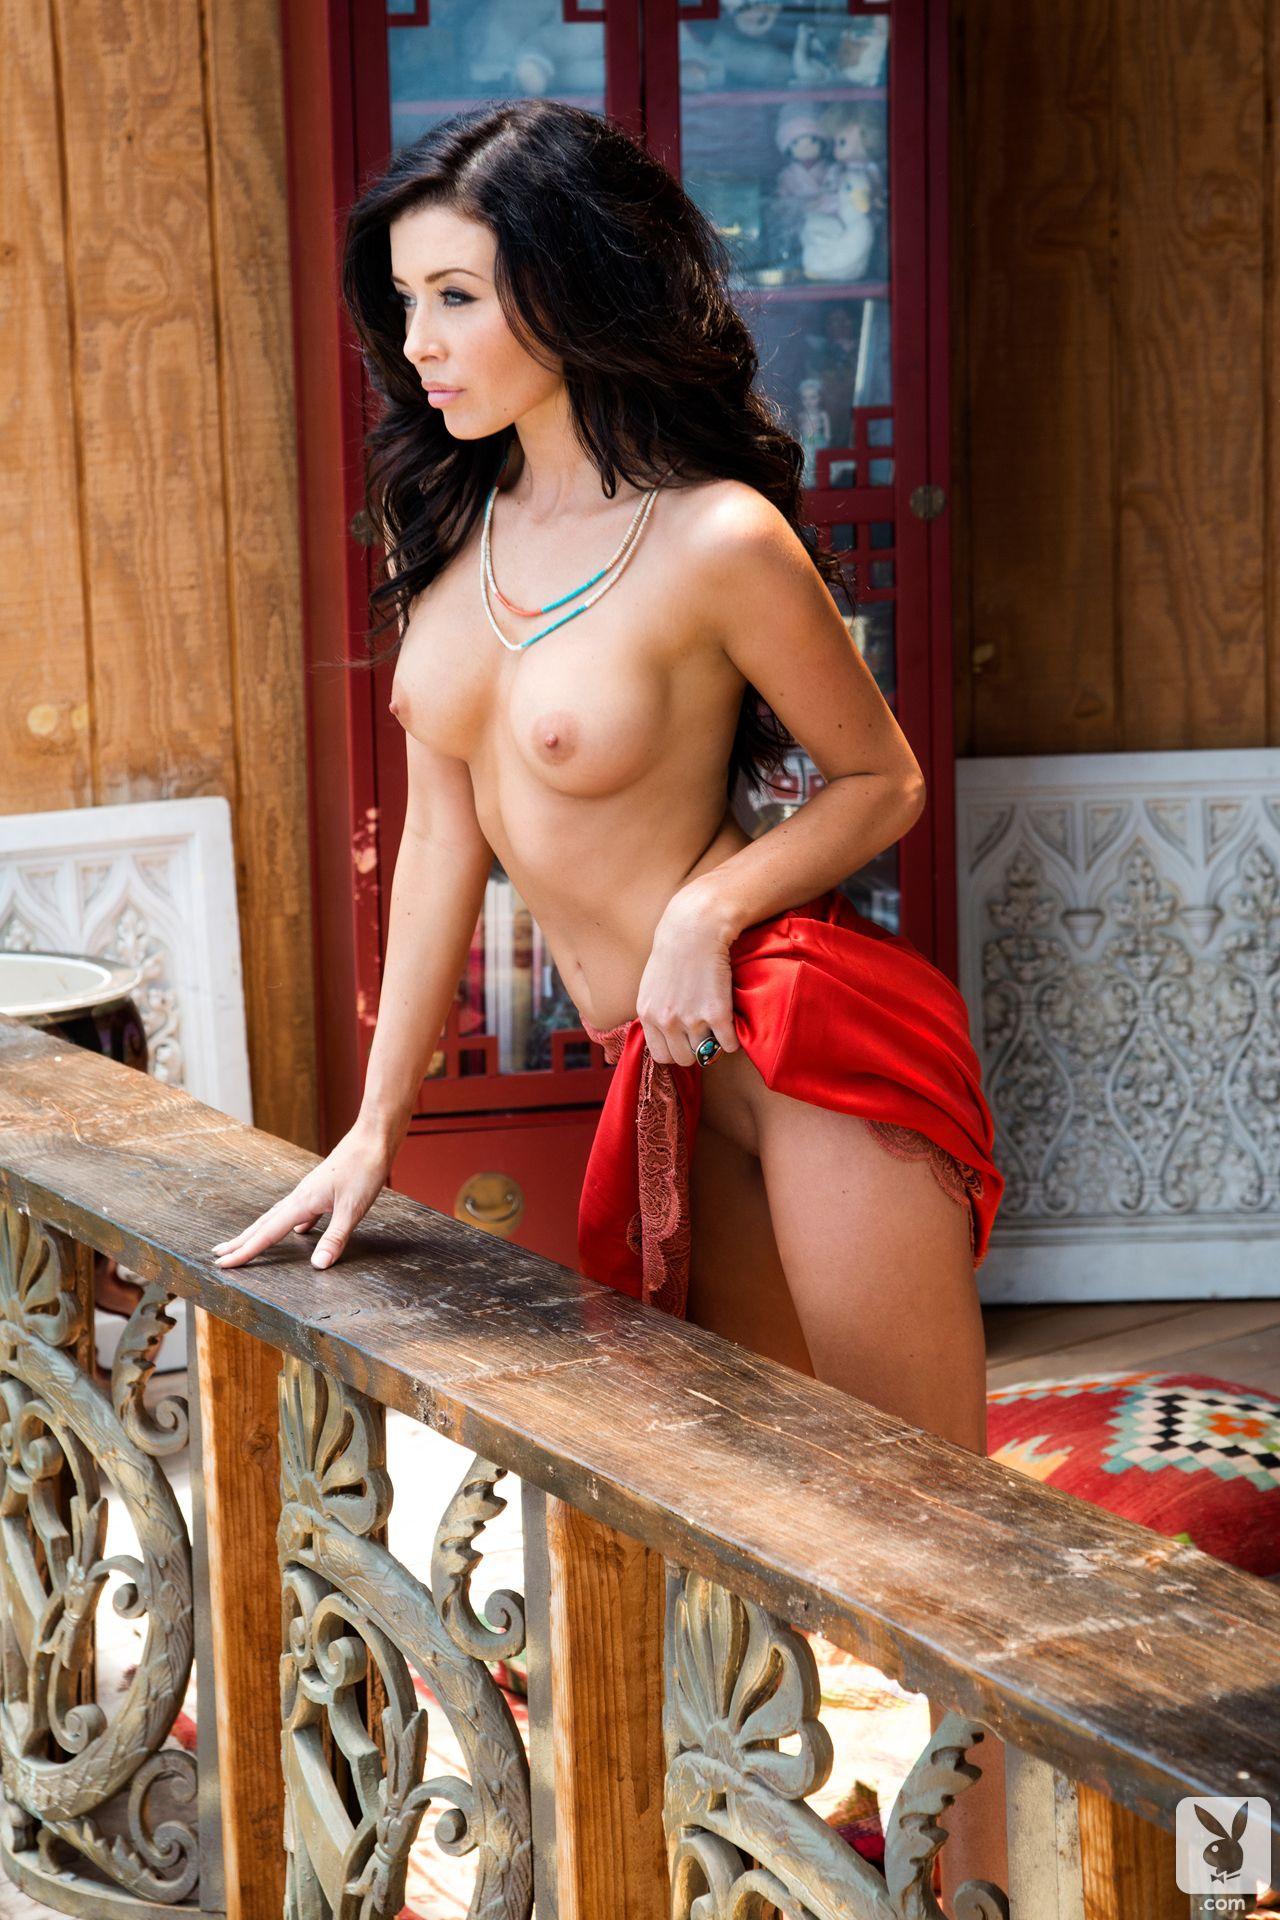 Gemma Lee Farrell Nude Awesome pinrgcoxx on gemma lee farrell | pinterest | chain belts, sexy